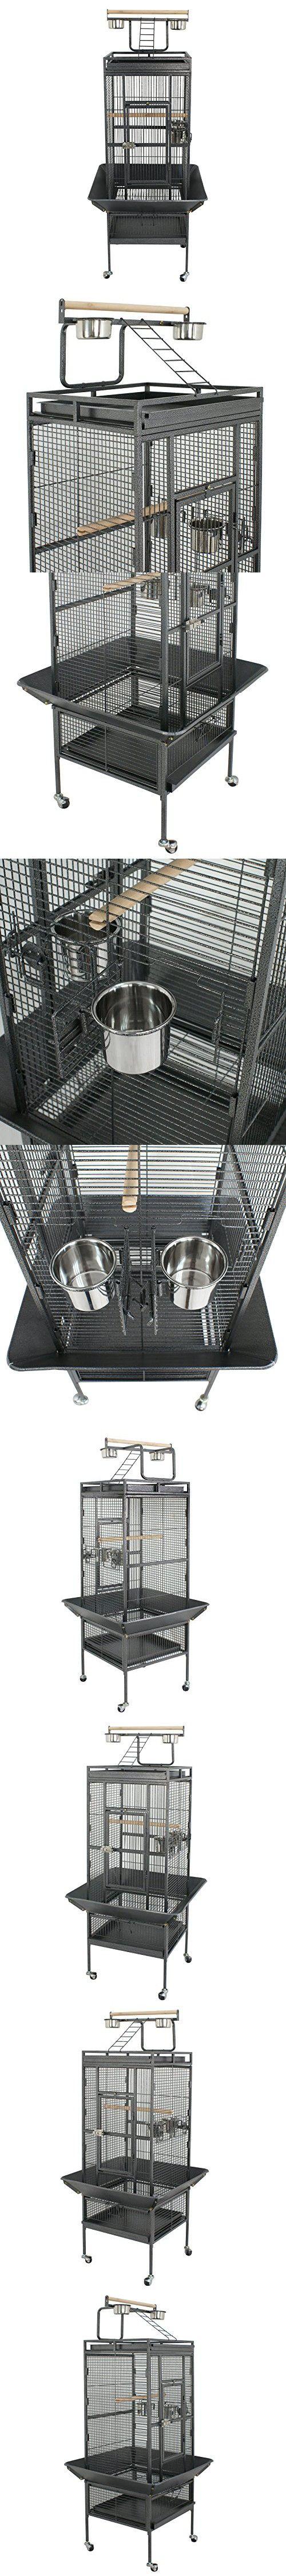 "ZENY 61"" Birdcage Pet Large Bird Cage Play Top Parrot Cockatiel Cockatoo Parakeet Finch Pet Supply (61"")"